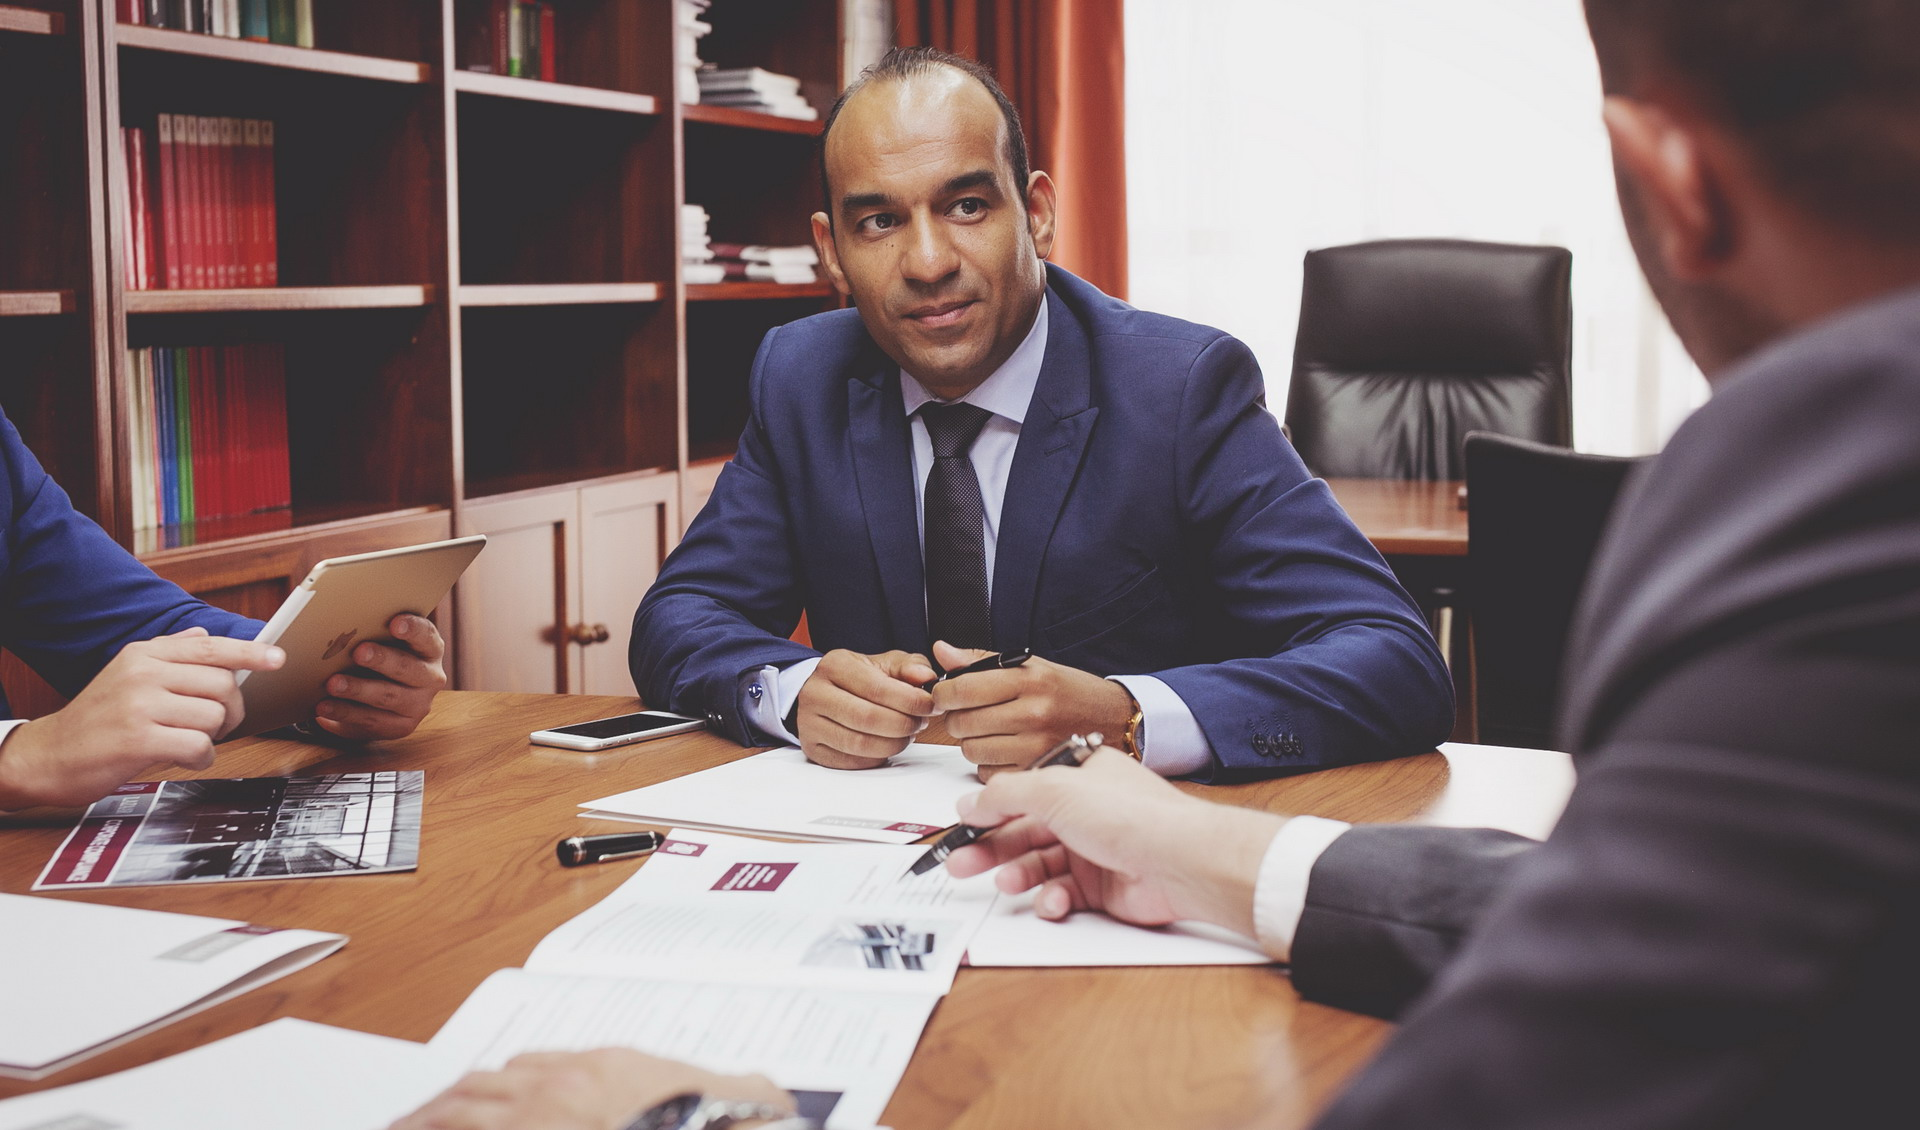 Accede a nuestro dossier 'Corporate Compliance'